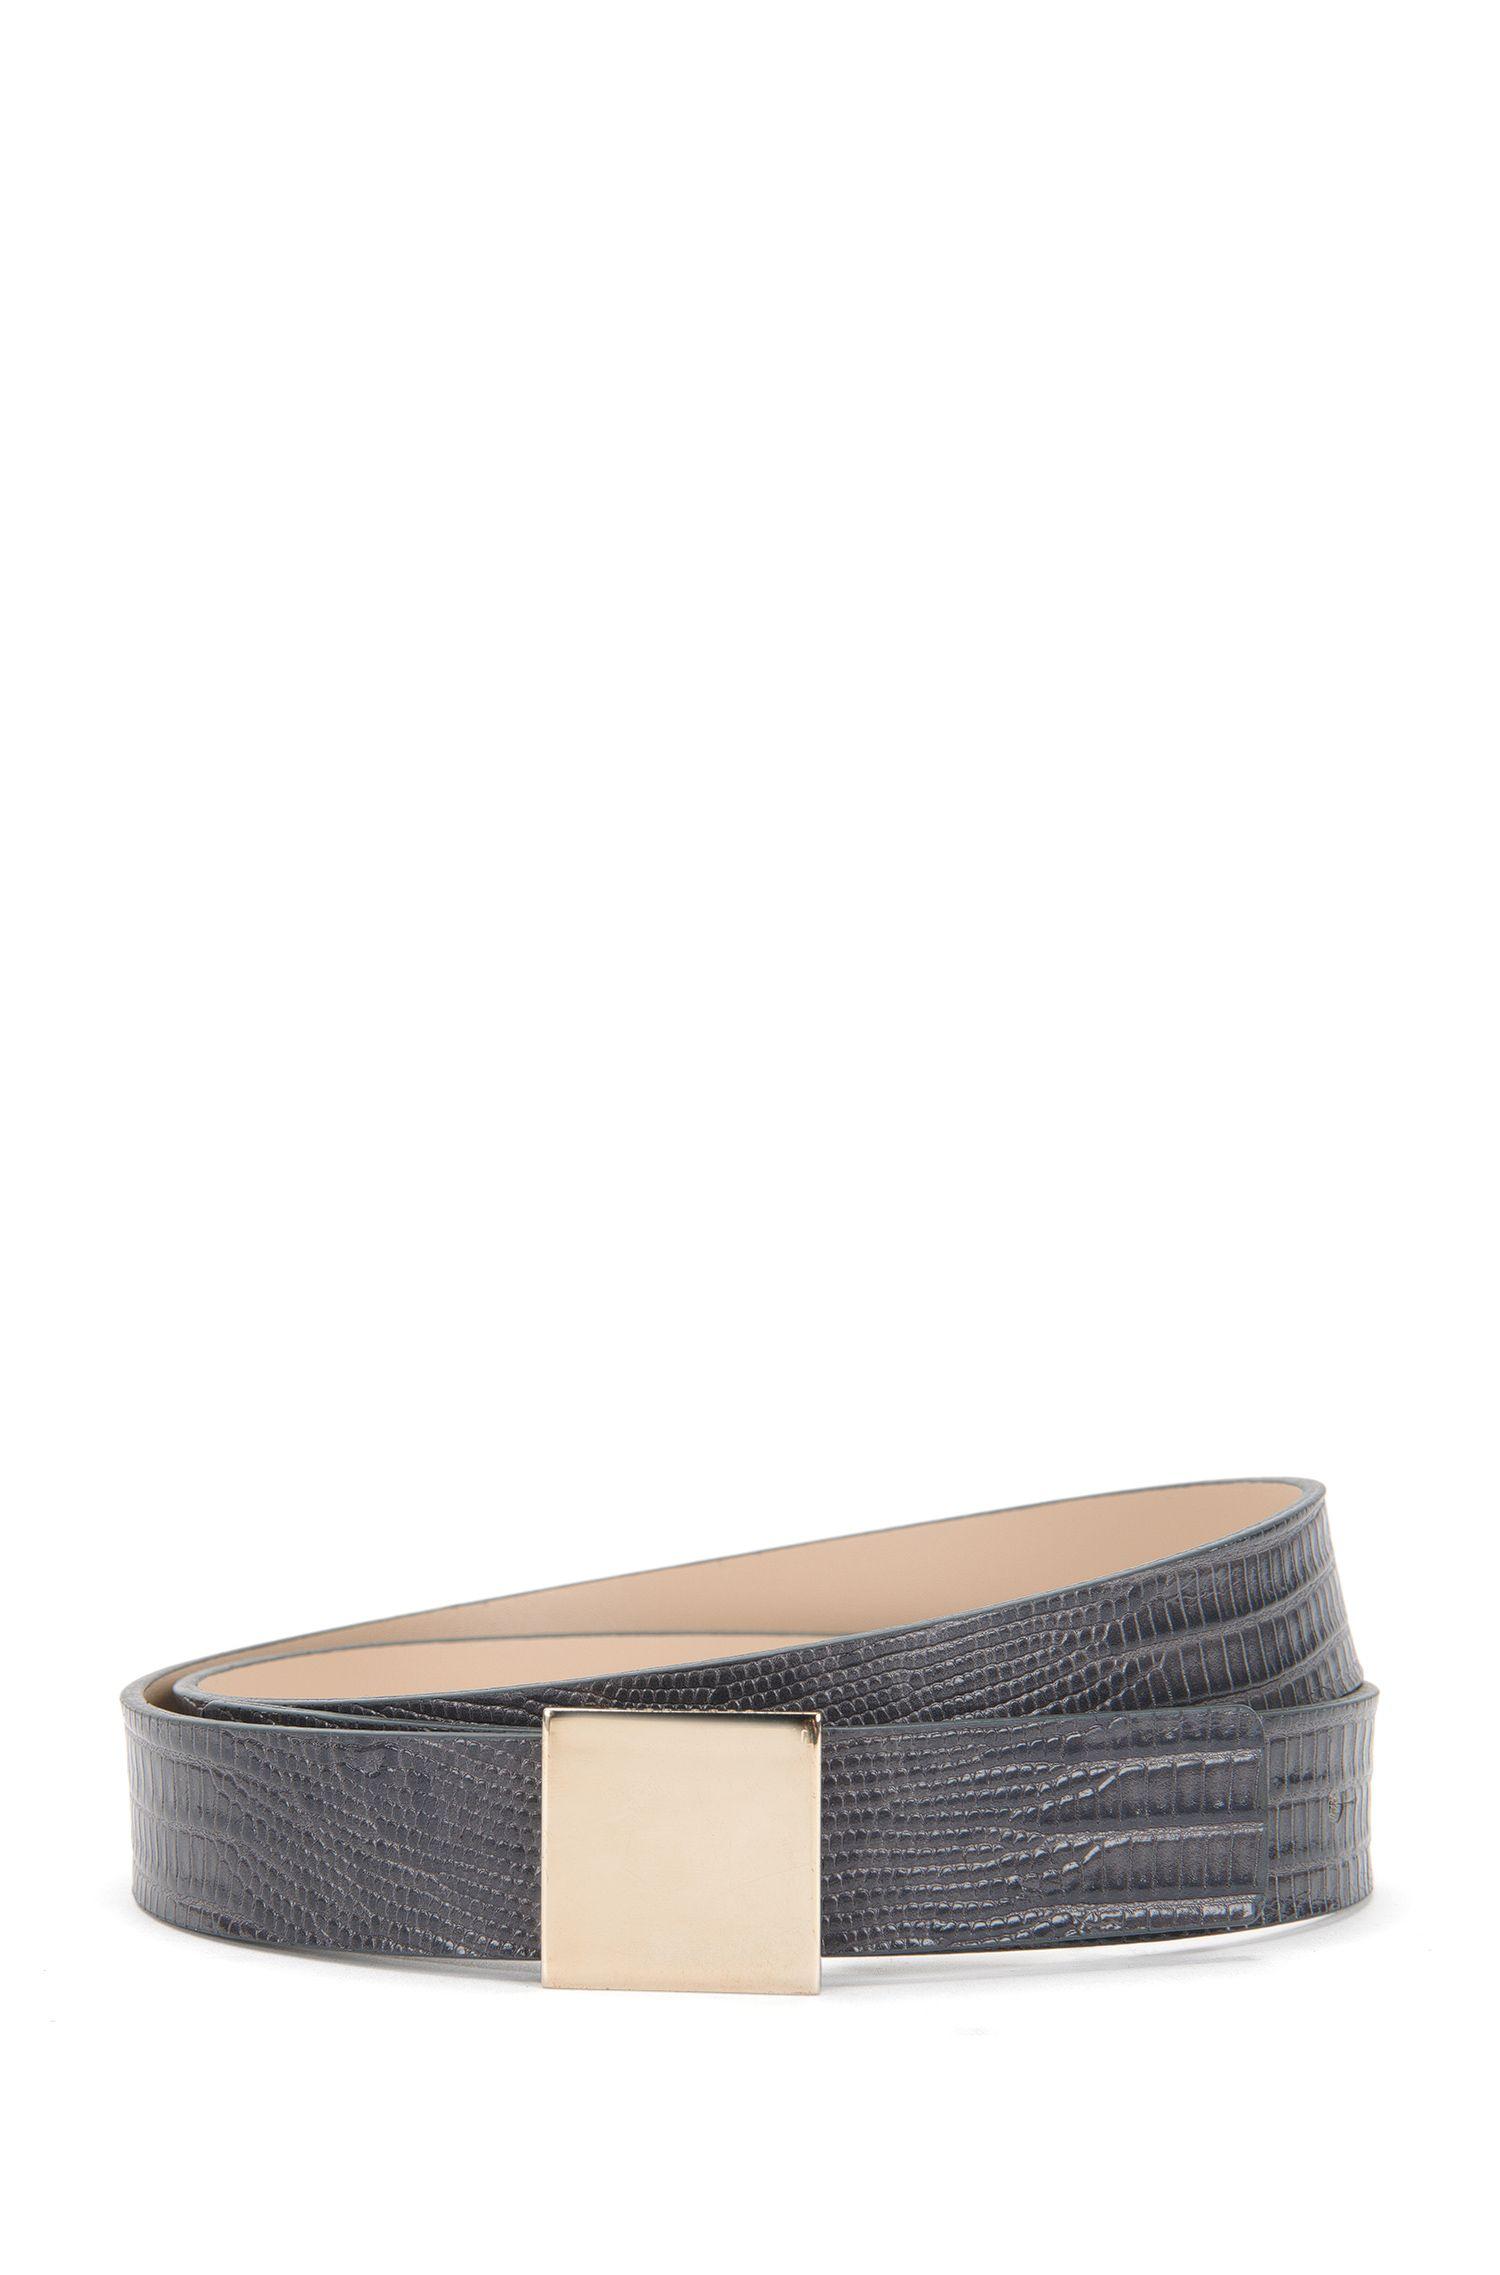 'Bell-L' | Reversible Plaque Leather Belt